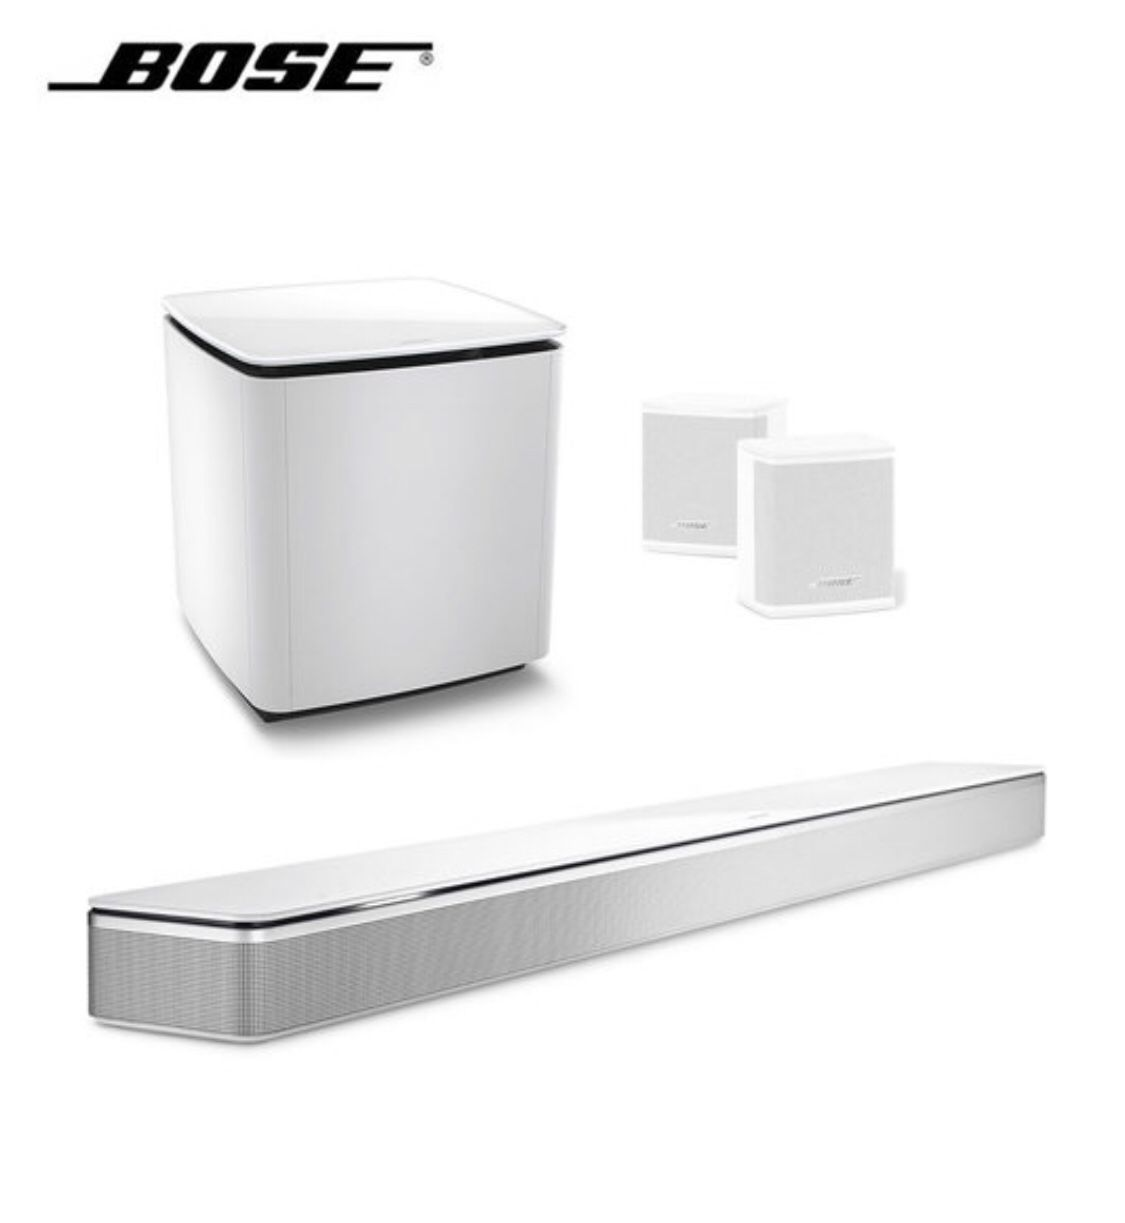 New Bose SoundBar 700 plus surround speakers